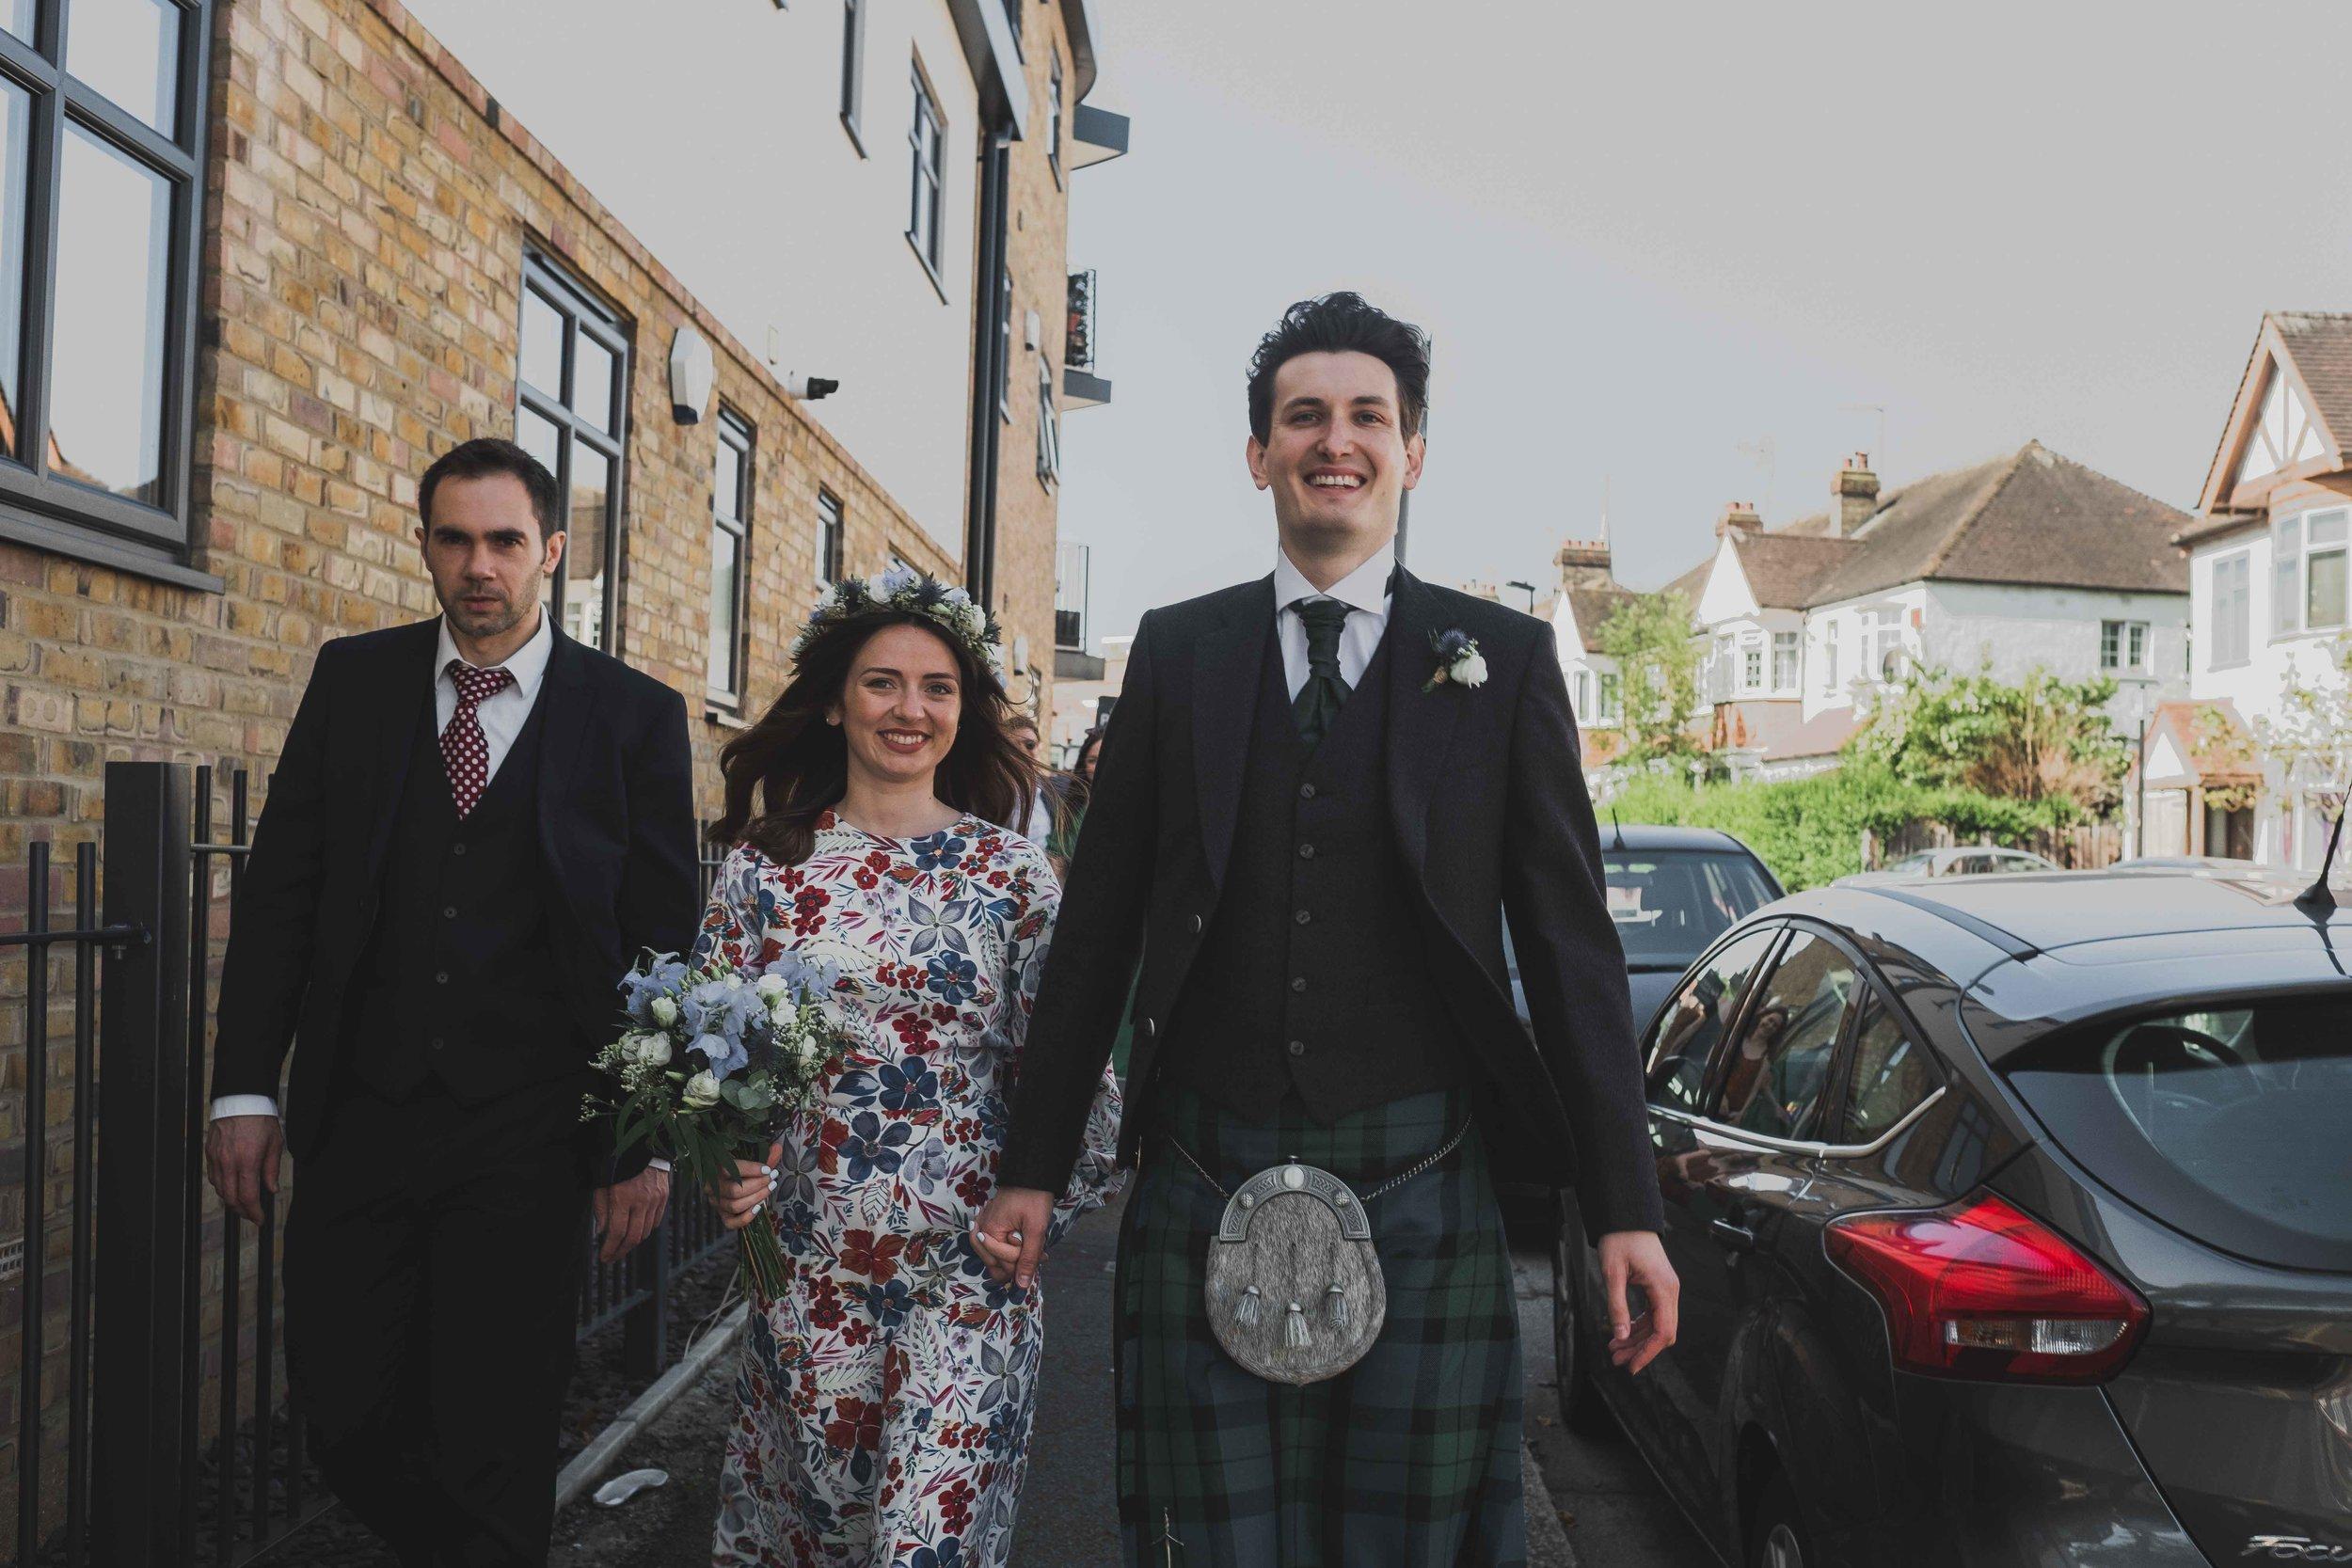 George Meehan House Wedding photographer